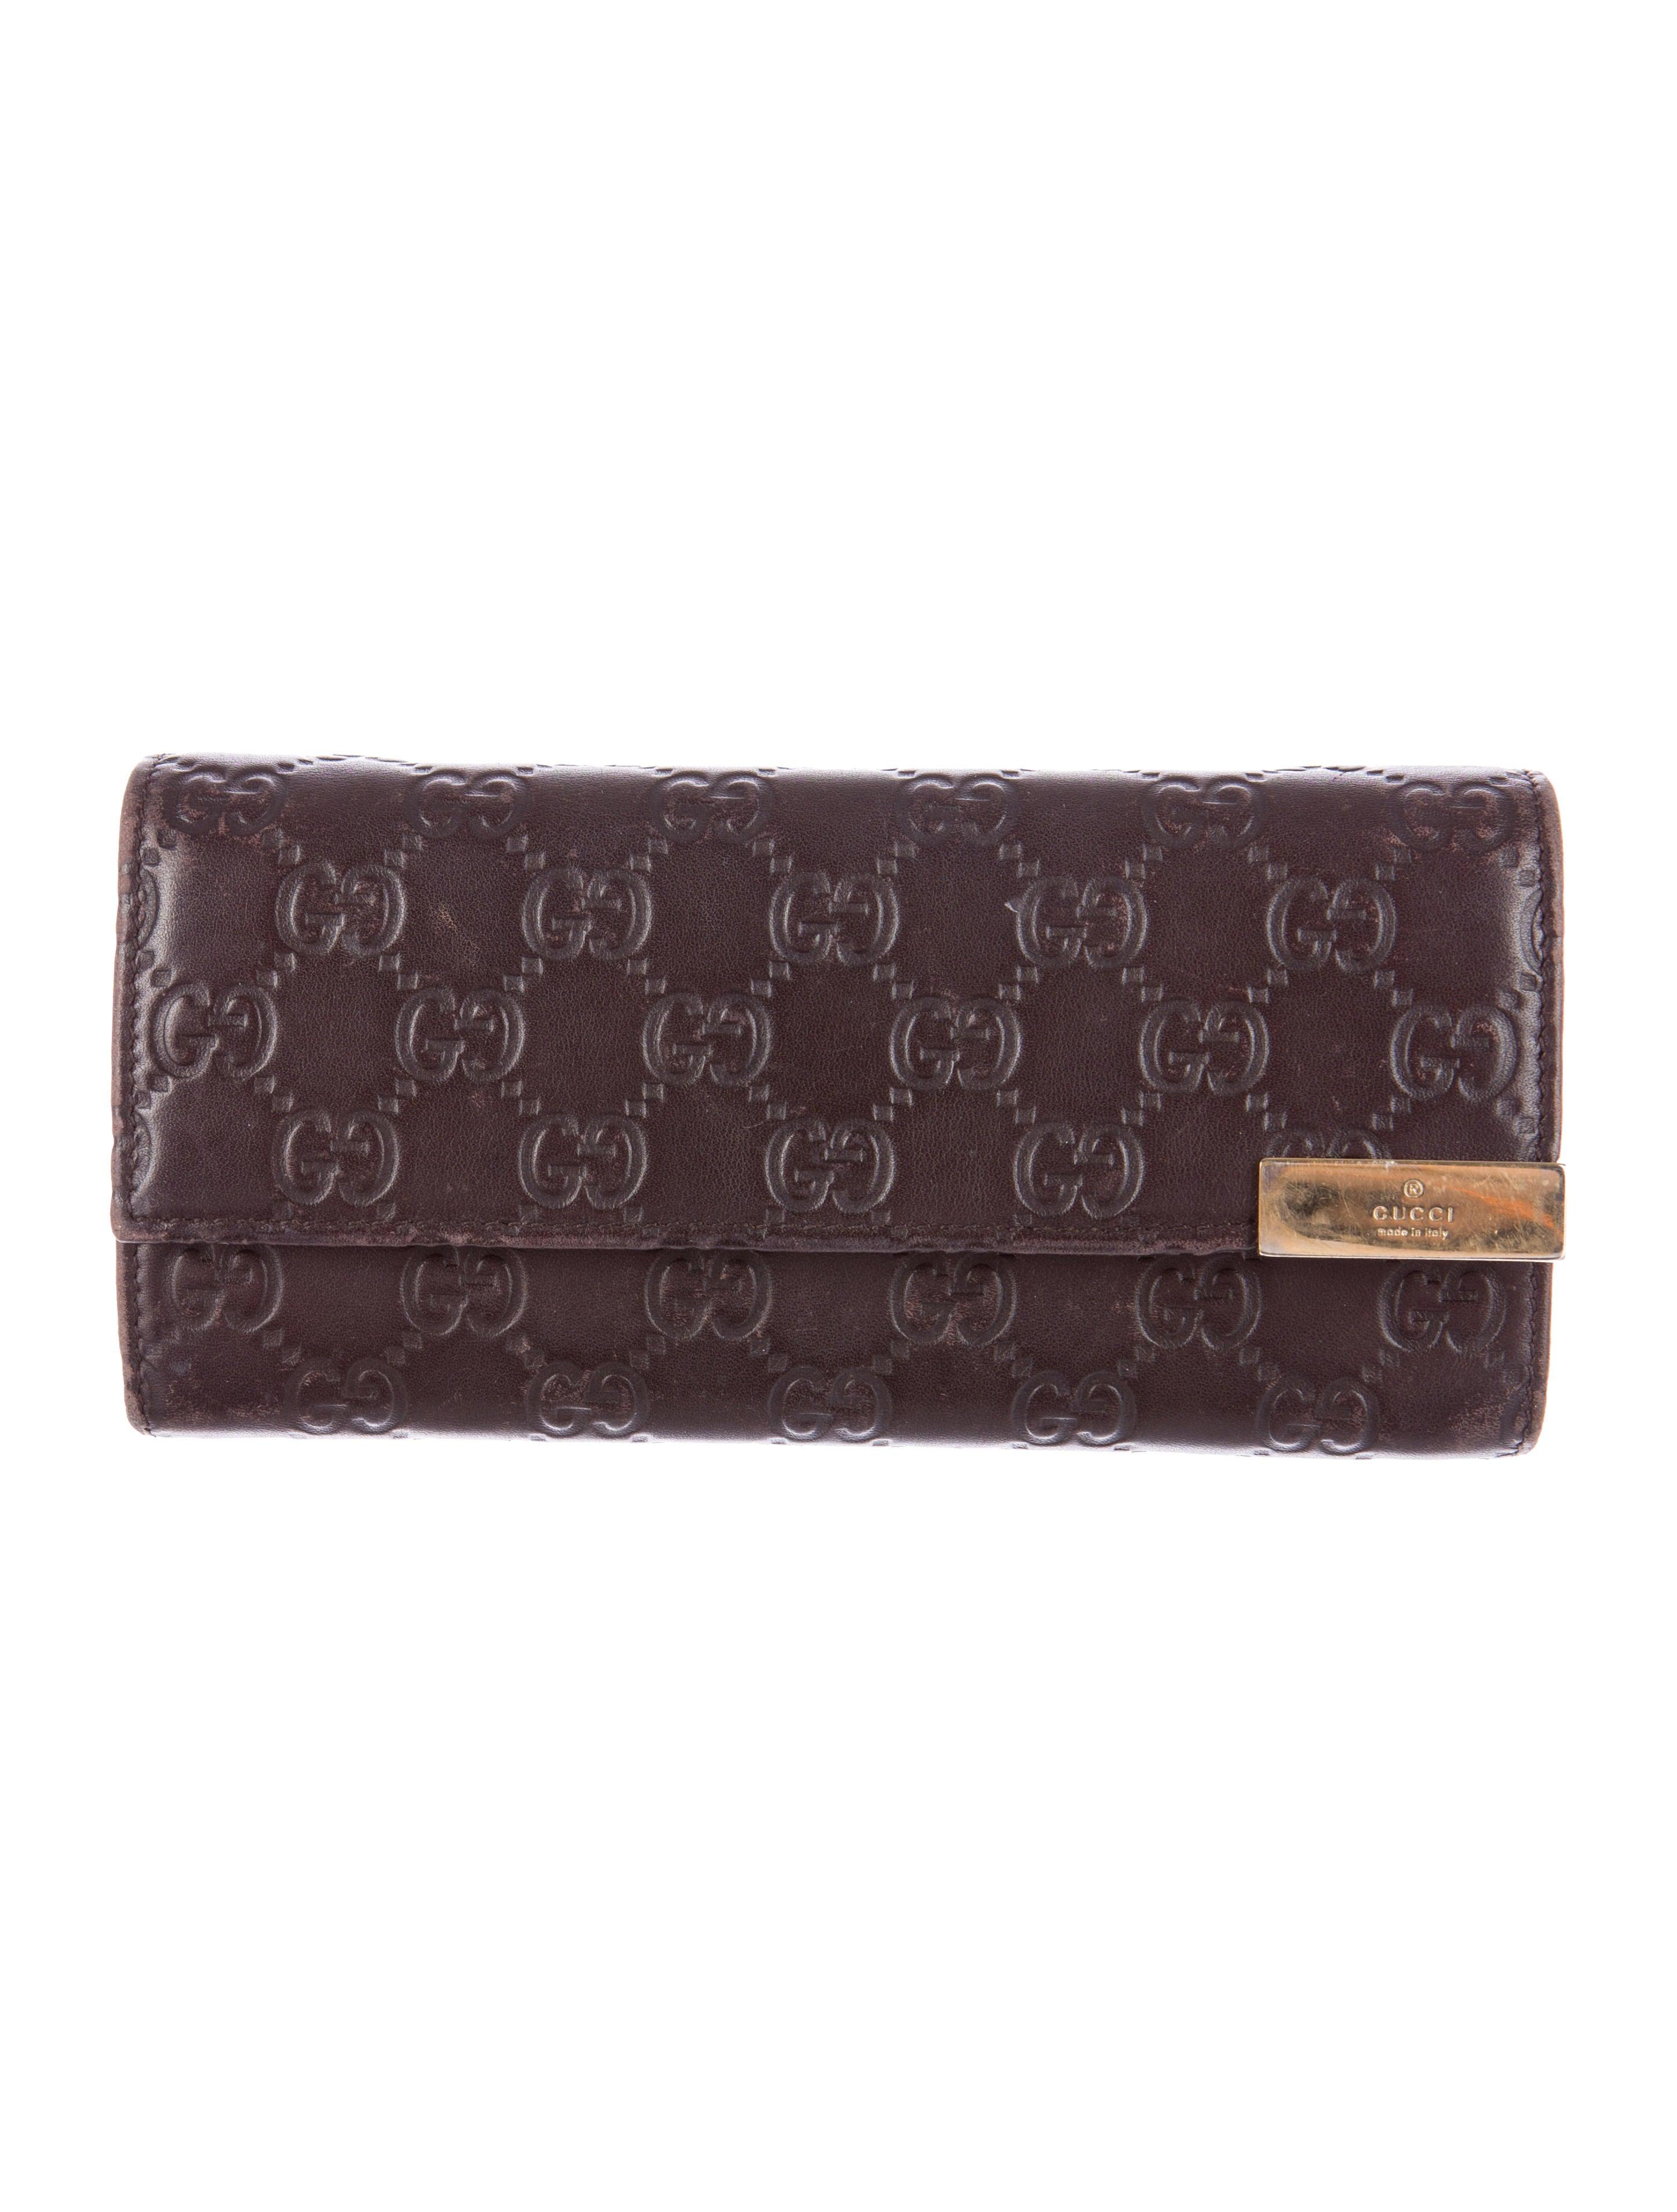 780853be4cae Gucci Dice Guccissima Chain Wallet - Accessories - GUC52819 | The ...